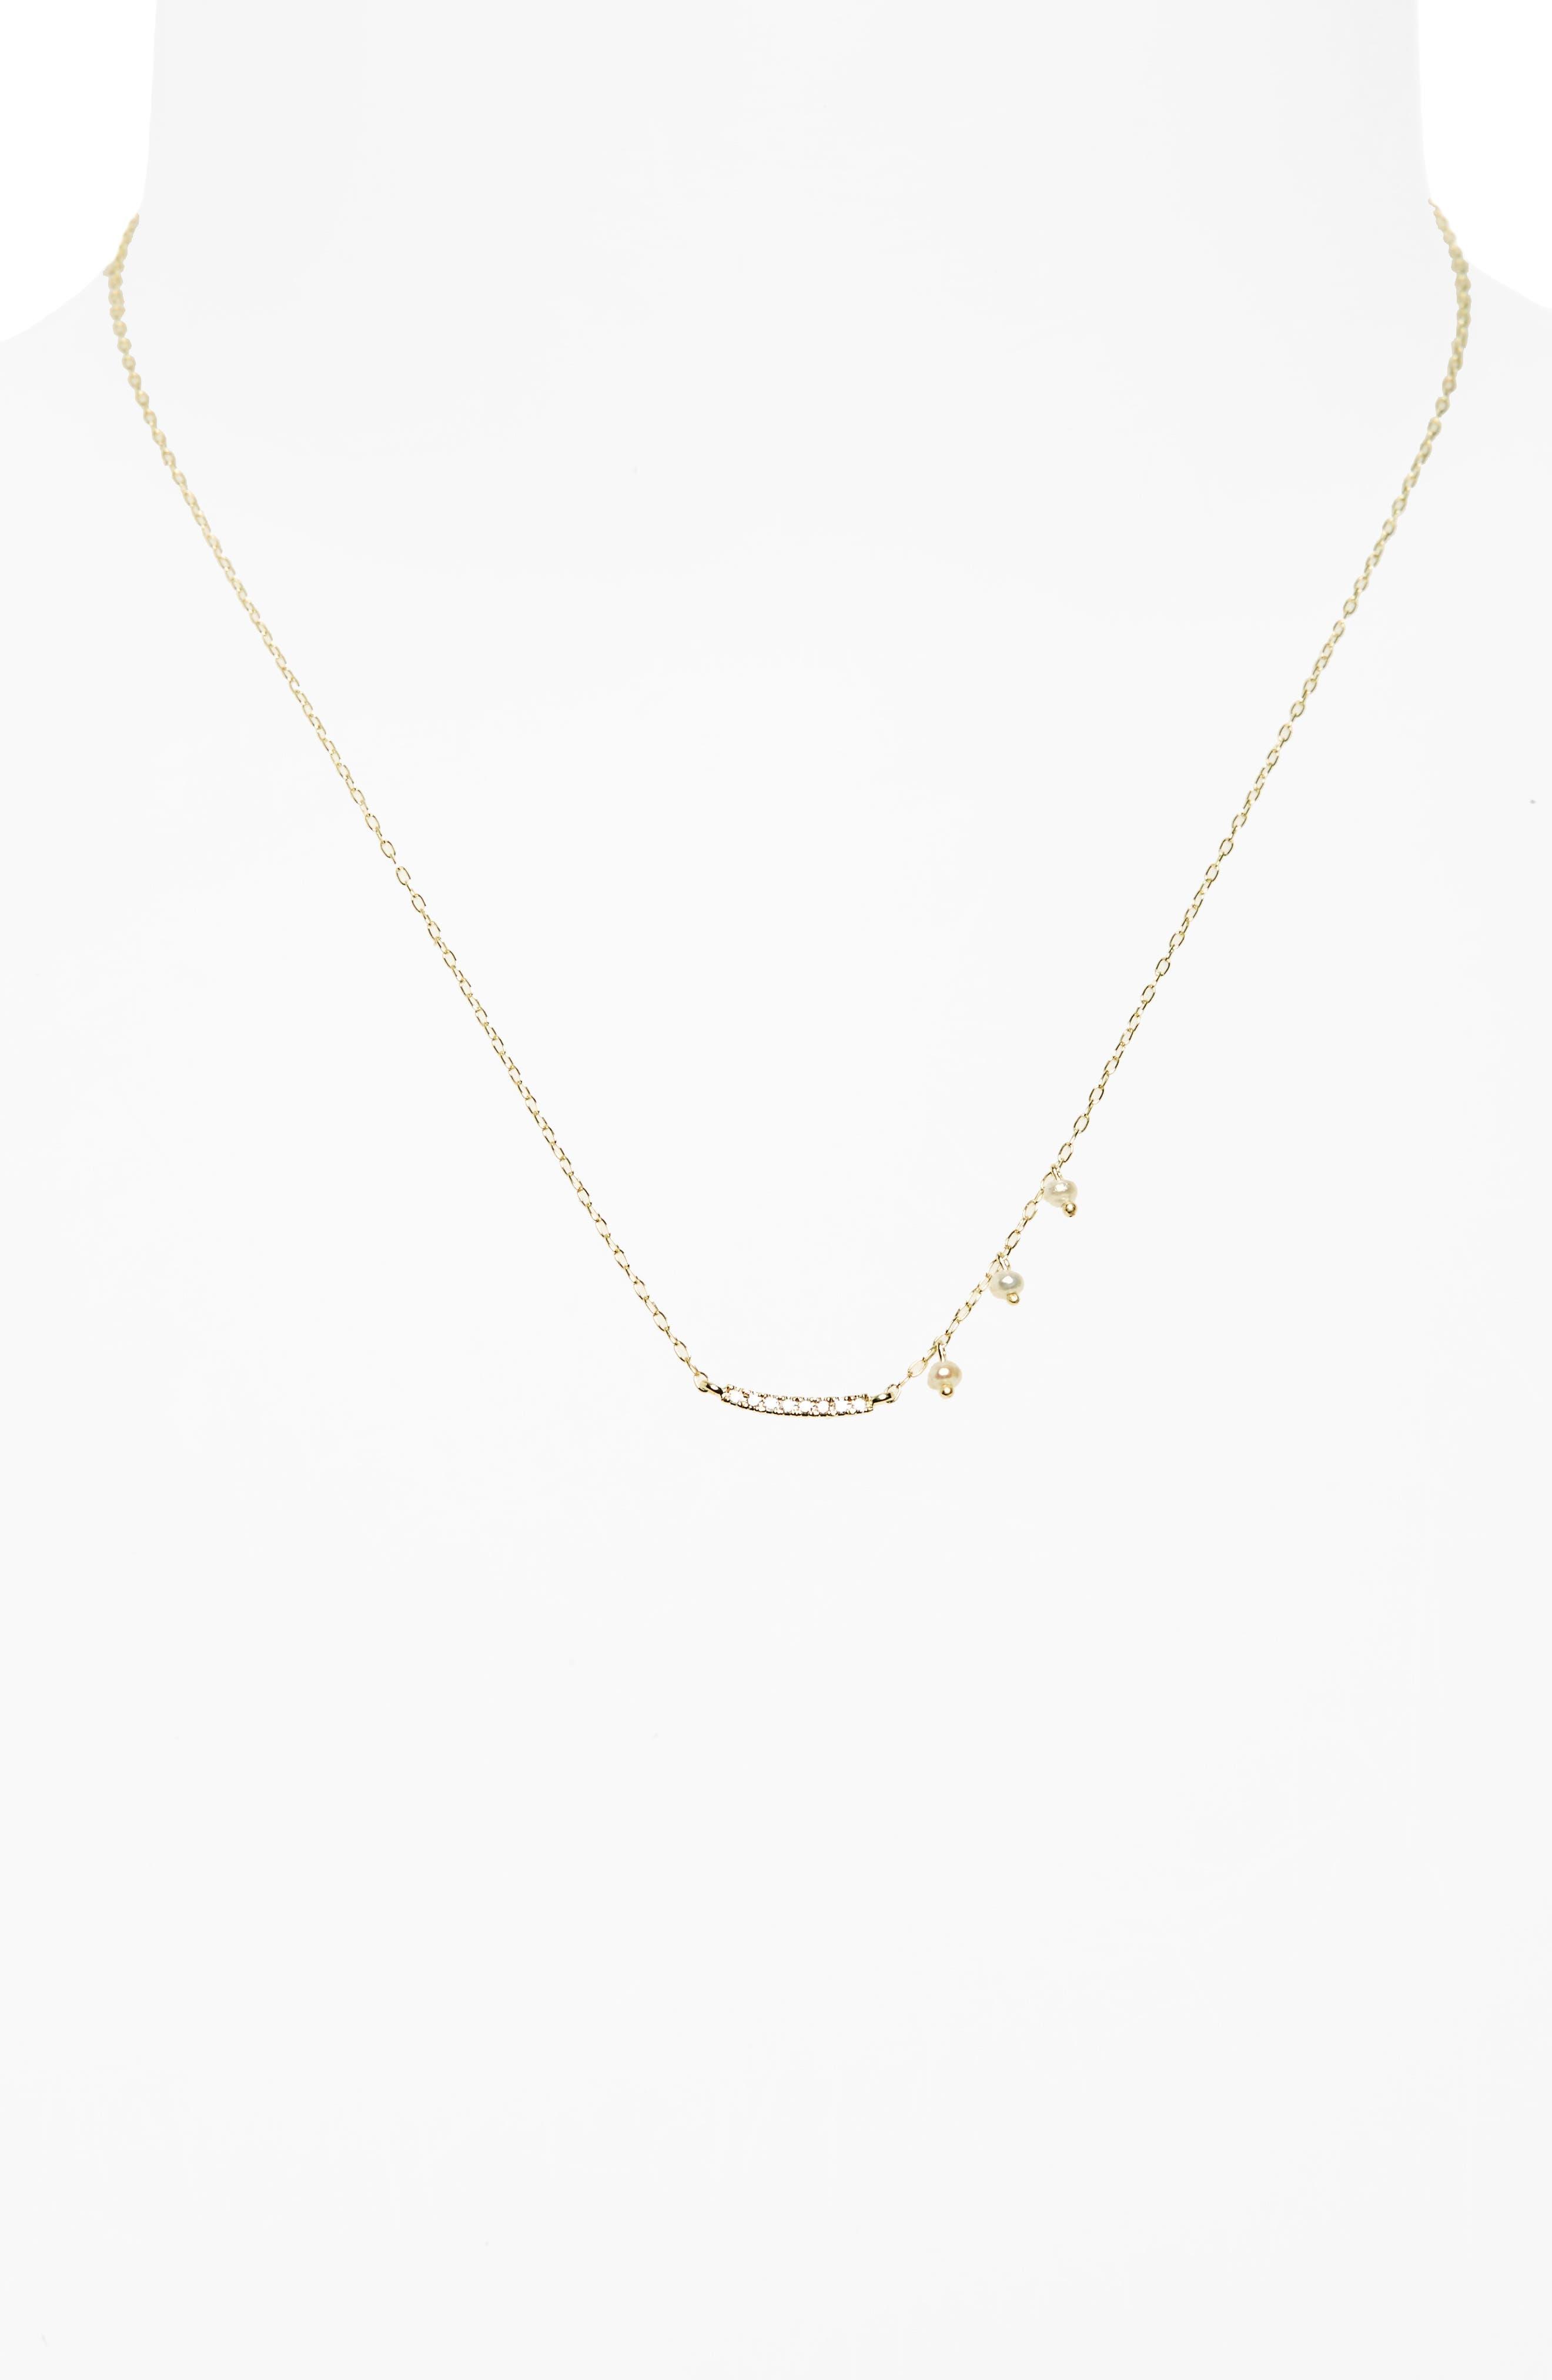 Meira T Fine Jewelry   Nordstrom